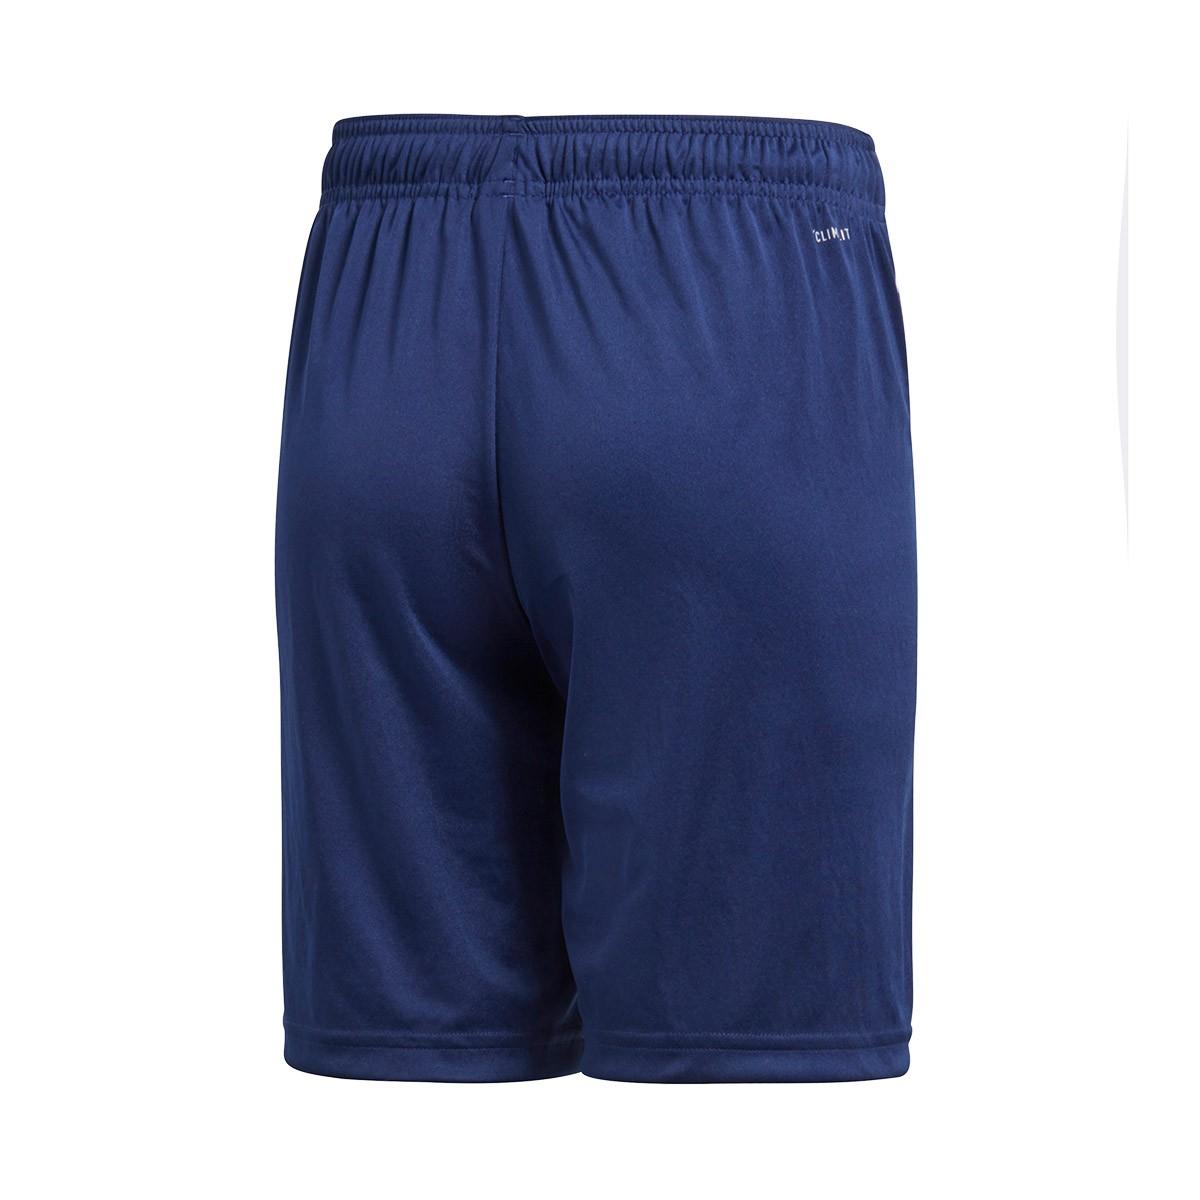 Bermuda Shorts adidas Kids Core 18 Training Dark blue-White - Leaked soccer 3483f9542